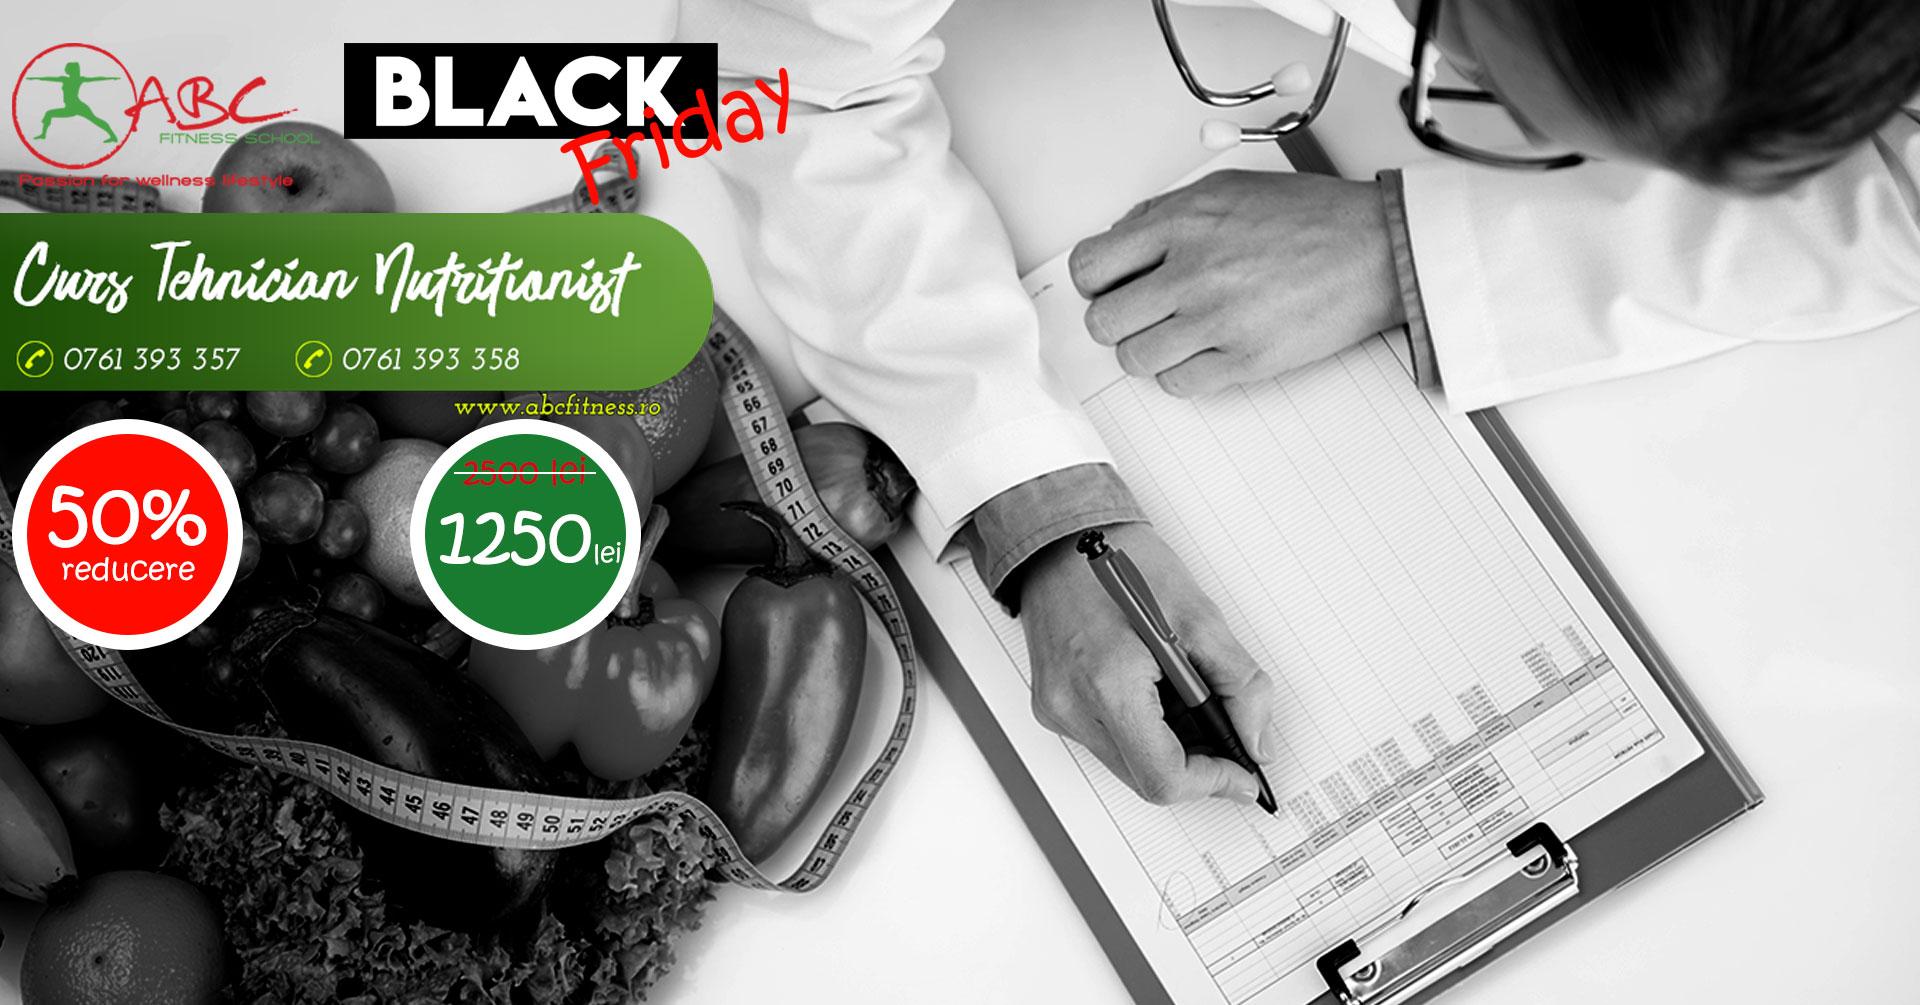 curs tehnician nutriționist - reducere black friday